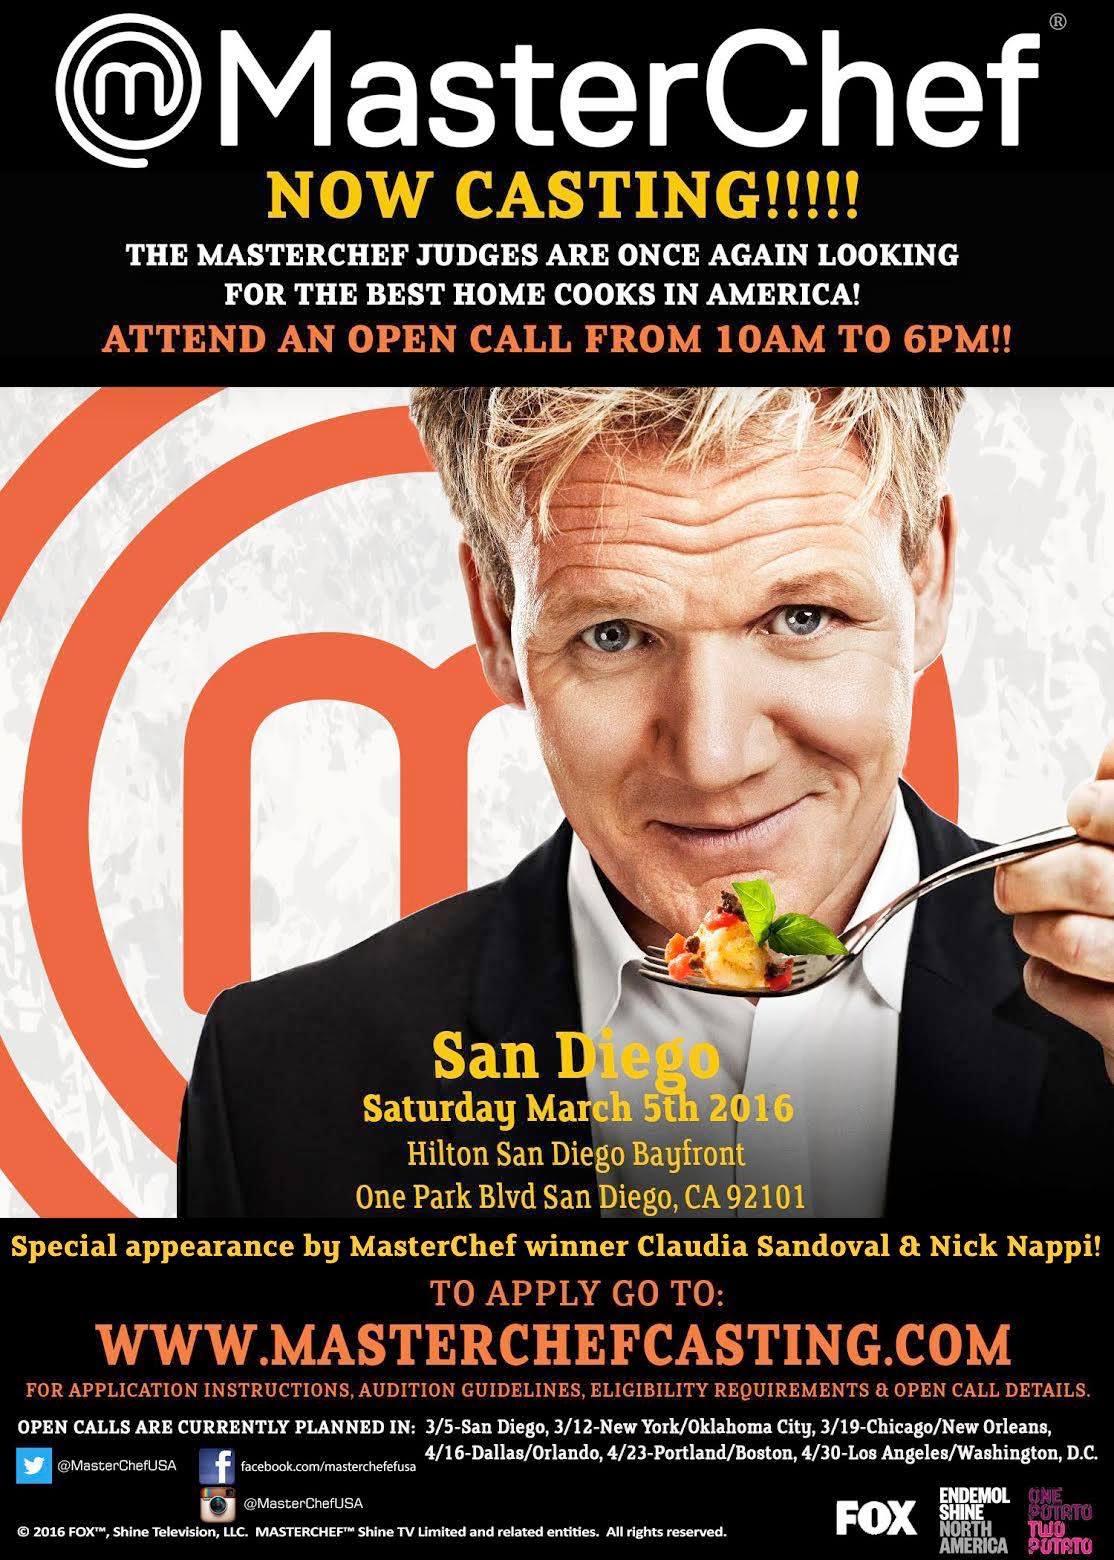 MasterChef Casting Call, San Diego, Home Cooks, chefs